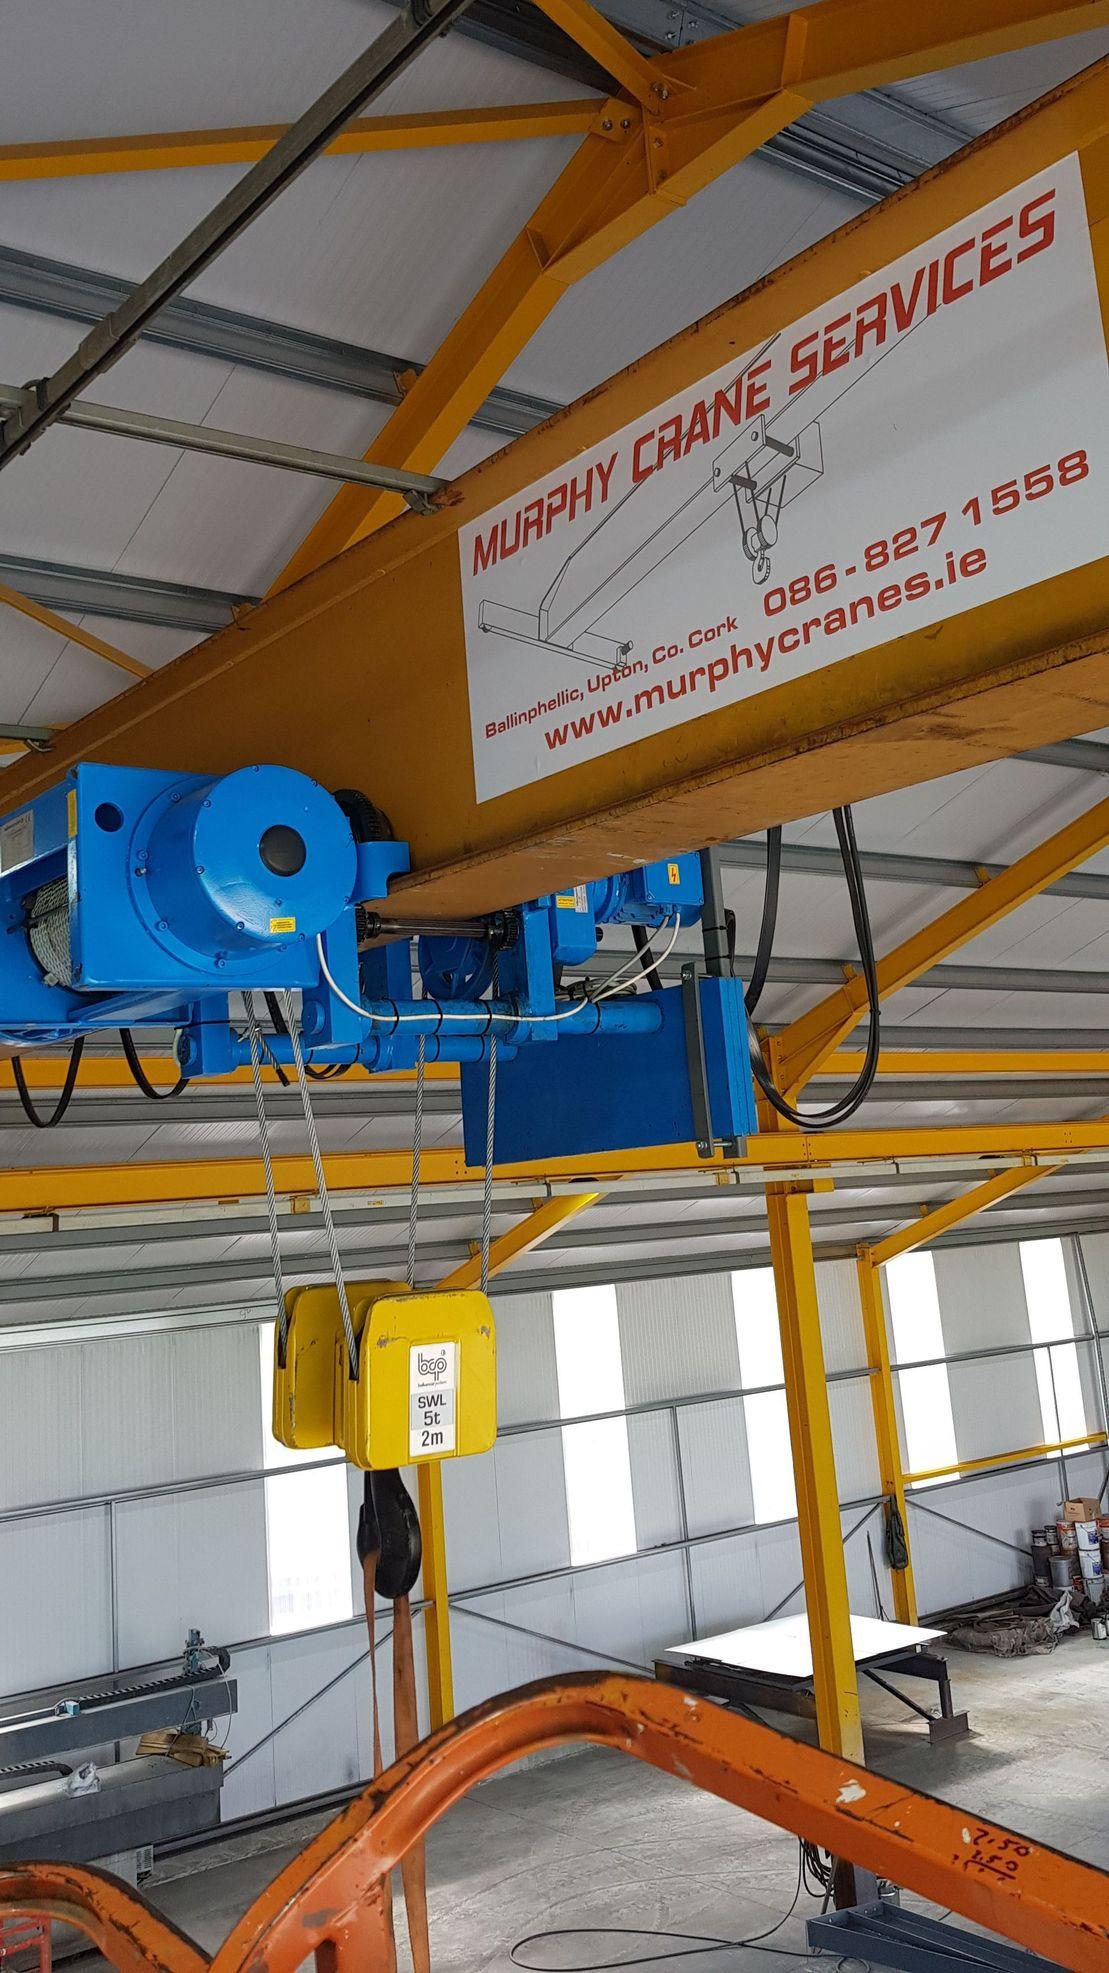 Murphy Crane Services | Cranes Sales, Serving | Cork